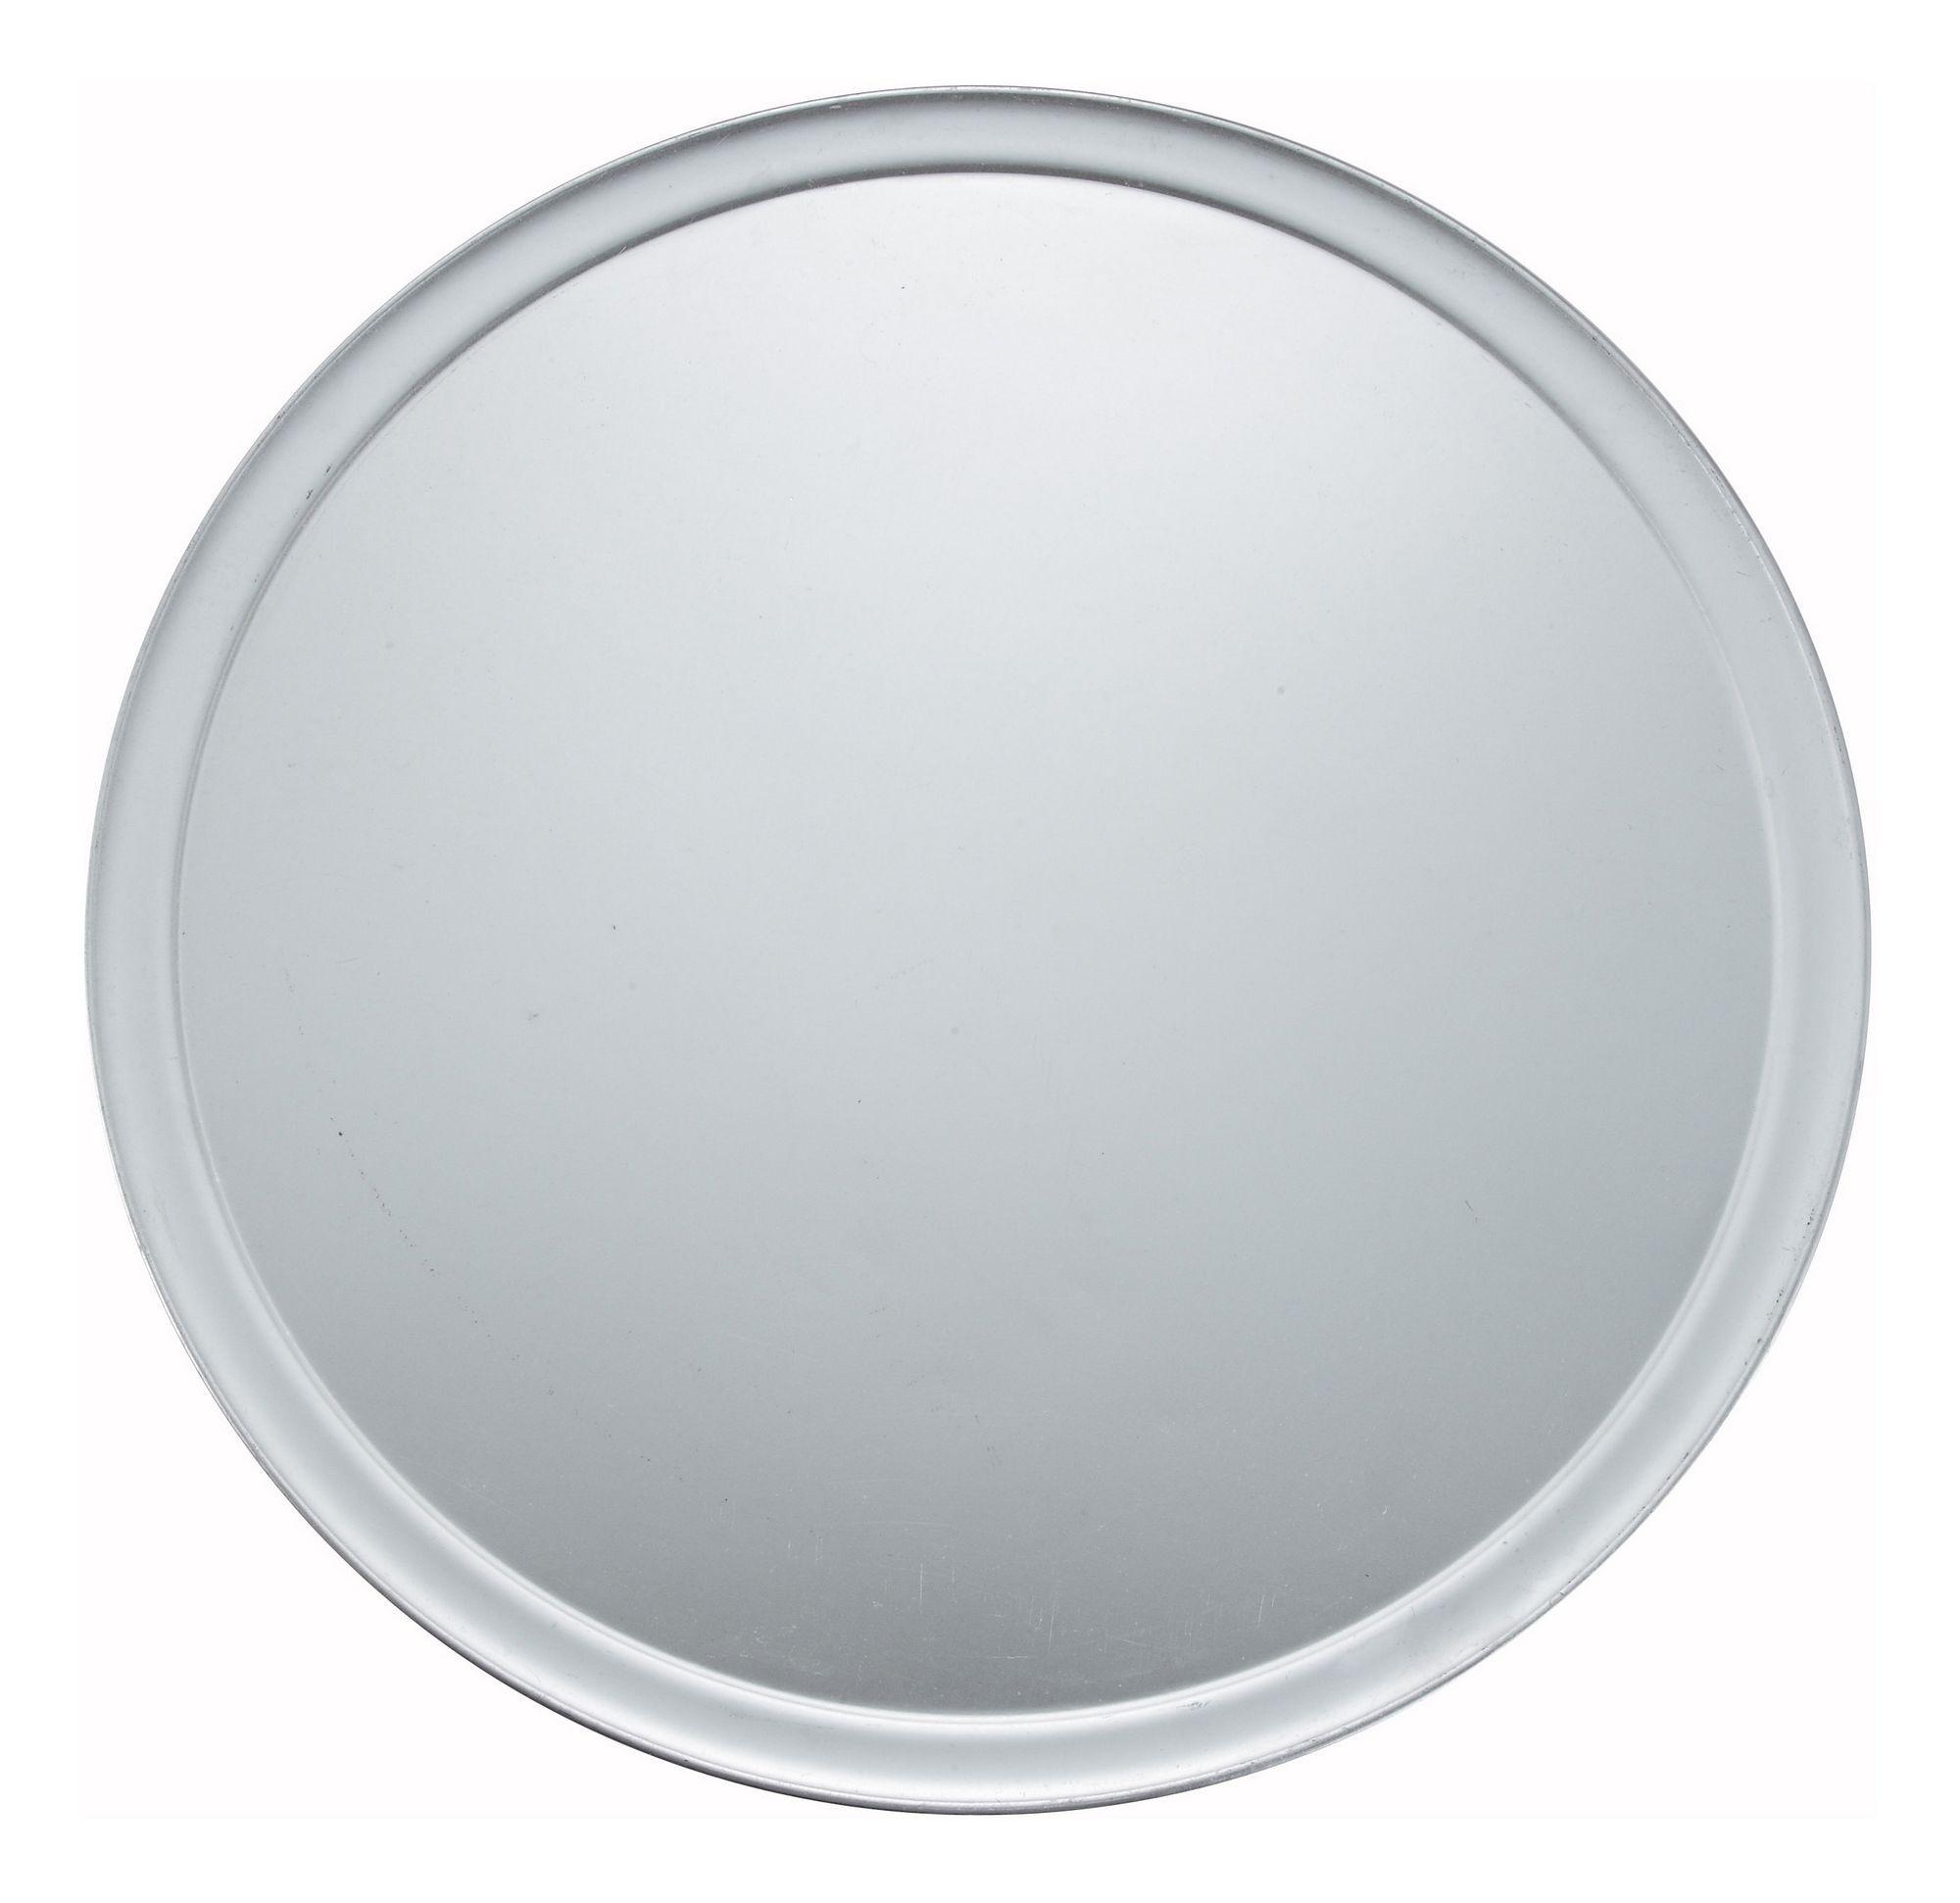 "Winco APZT-18 Wide-Rimmed Aluminum Pizza Pan 18"" Dia."